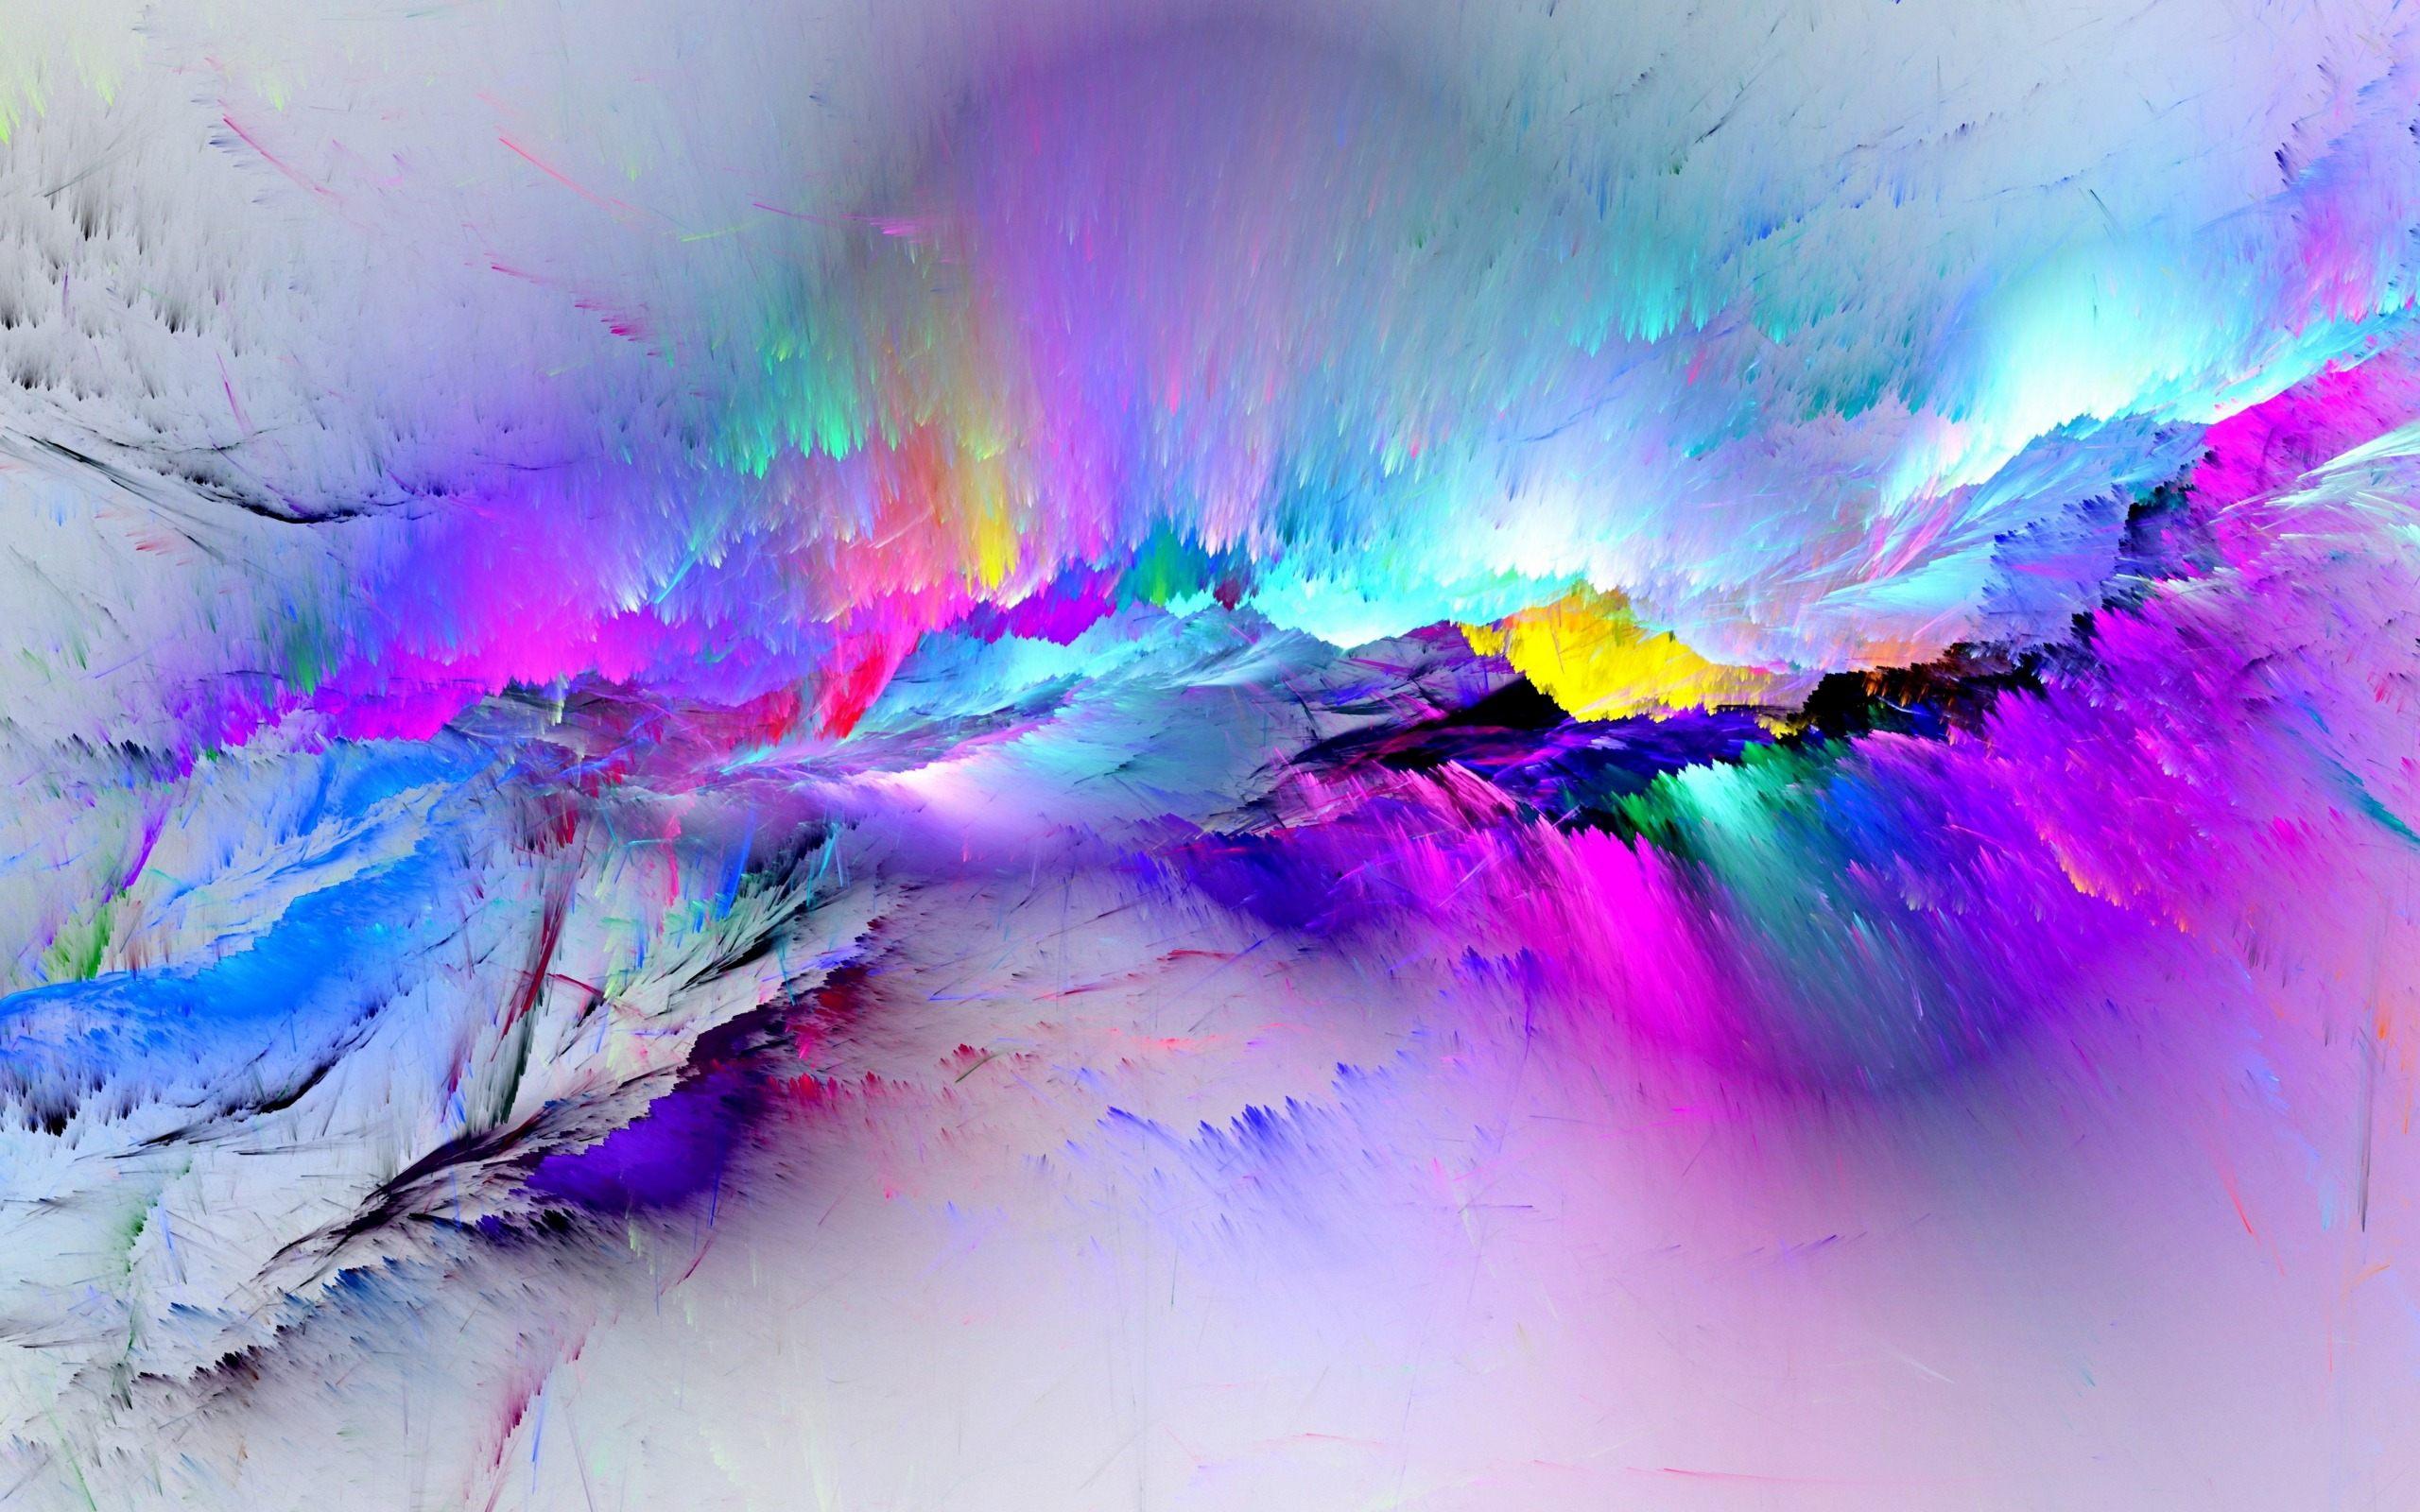 splash of color hd - photo #16